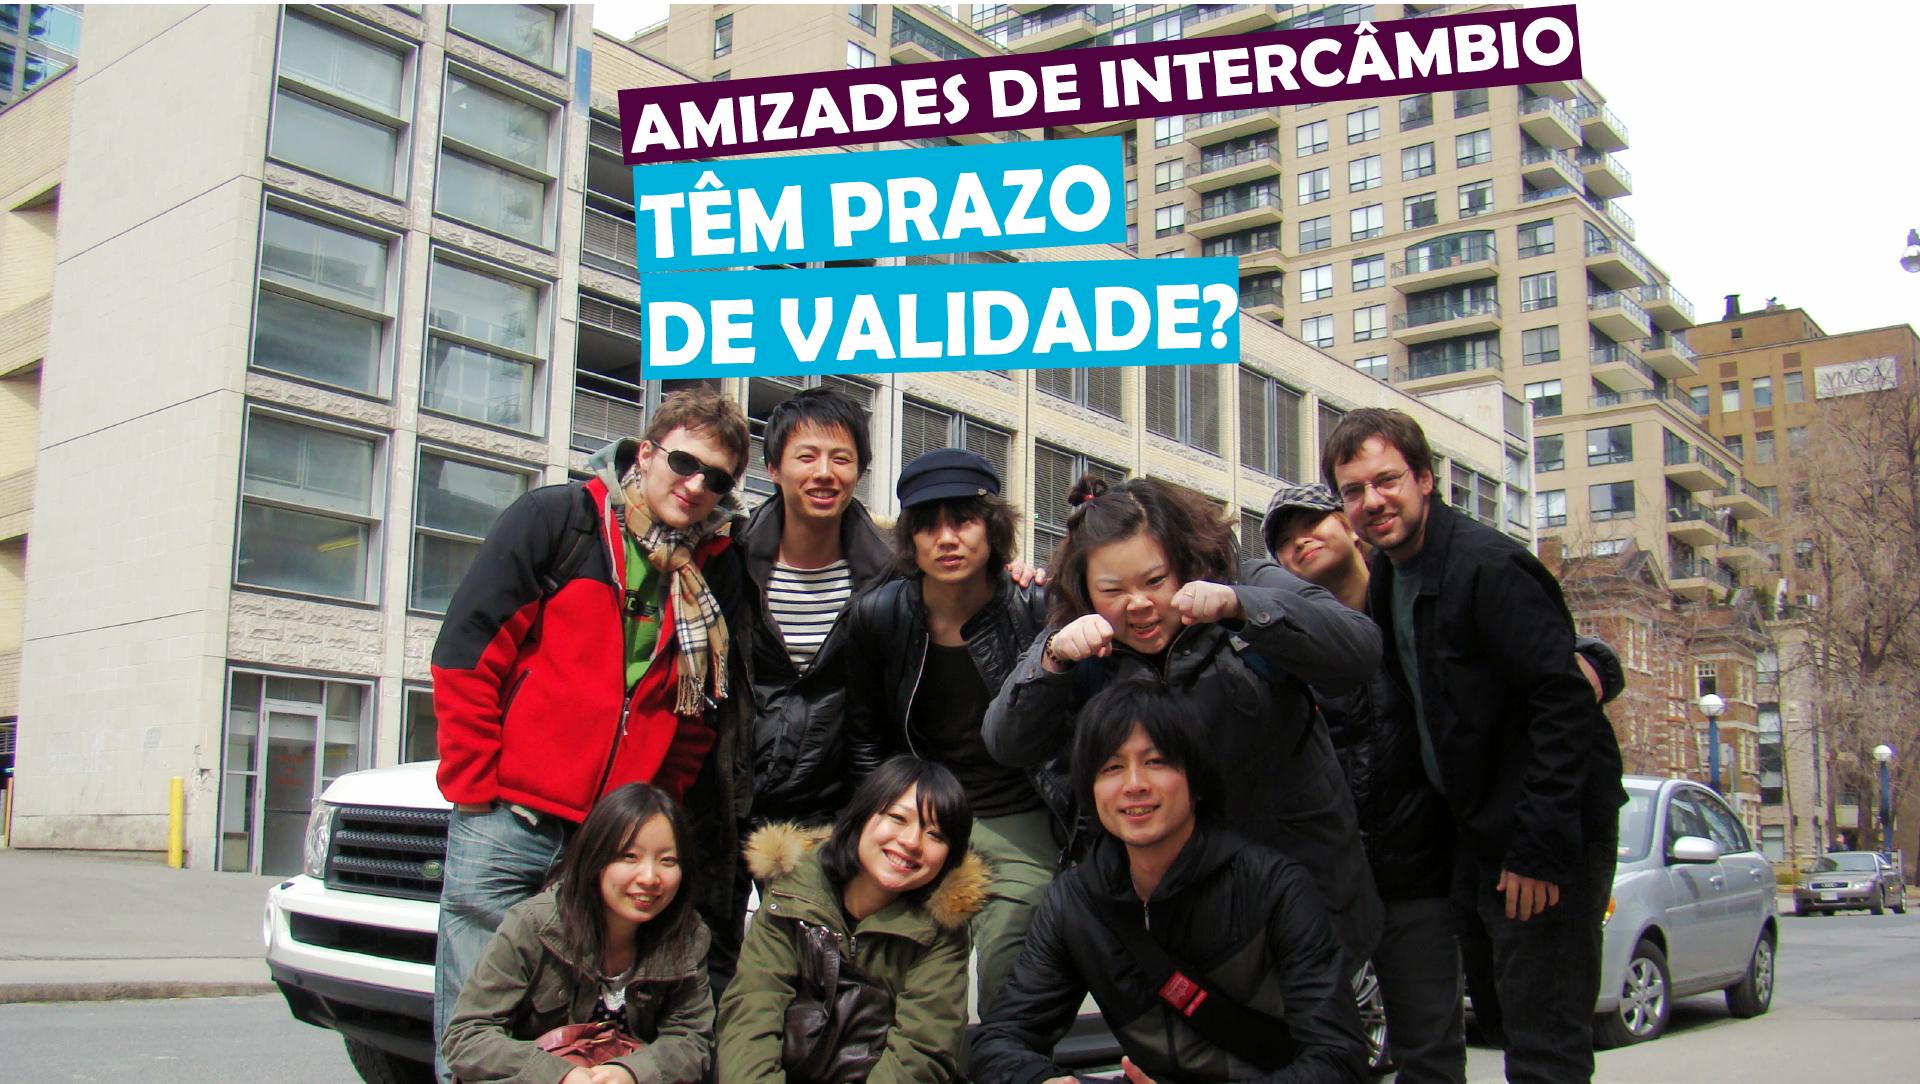 You are currently viewing Amizades de intercâmbio têm prazo de validade?